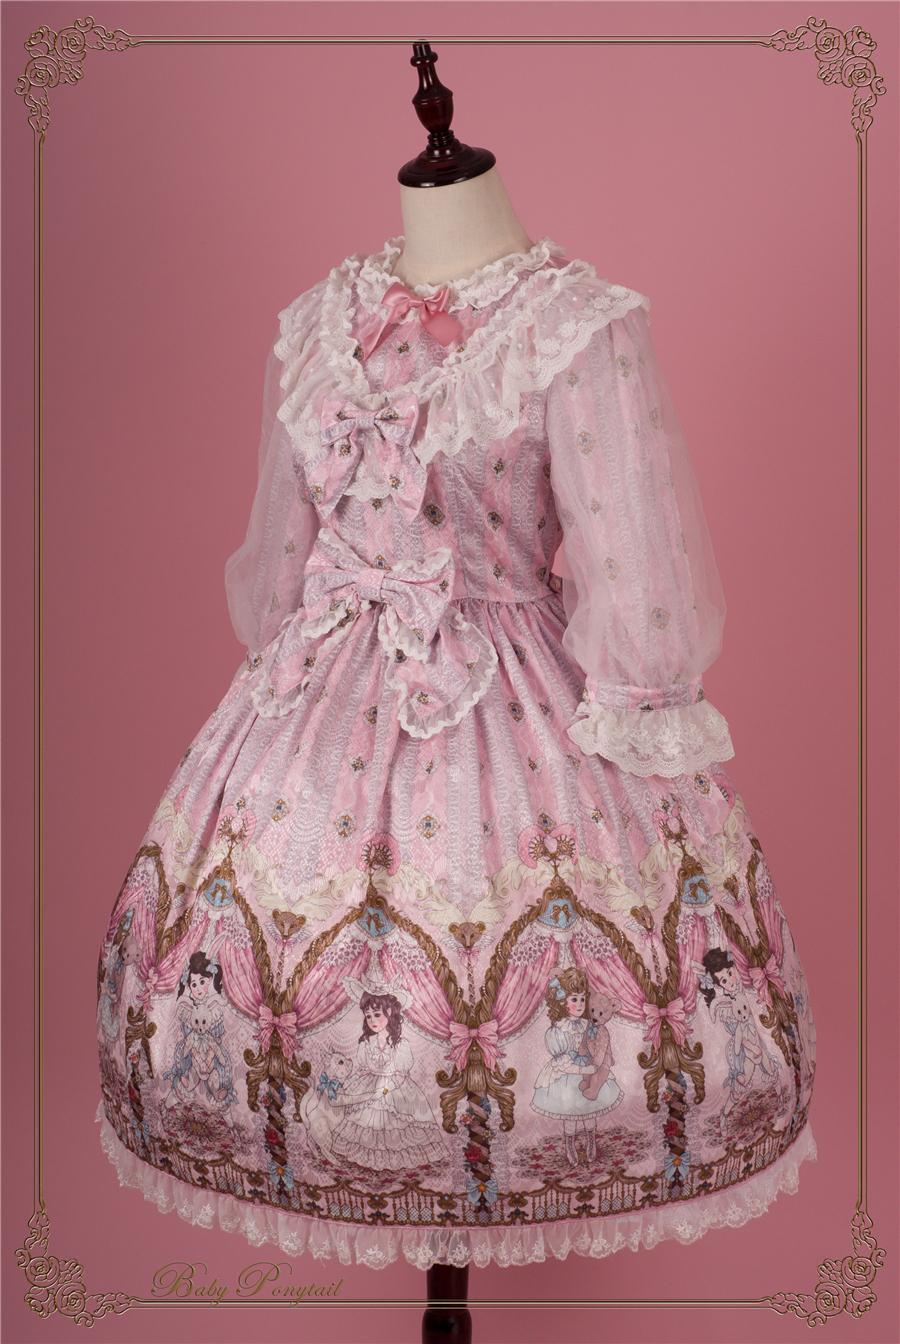 BabyPonytail_Stock Photo_My Favorite Companion_OP Pink_3.jpg